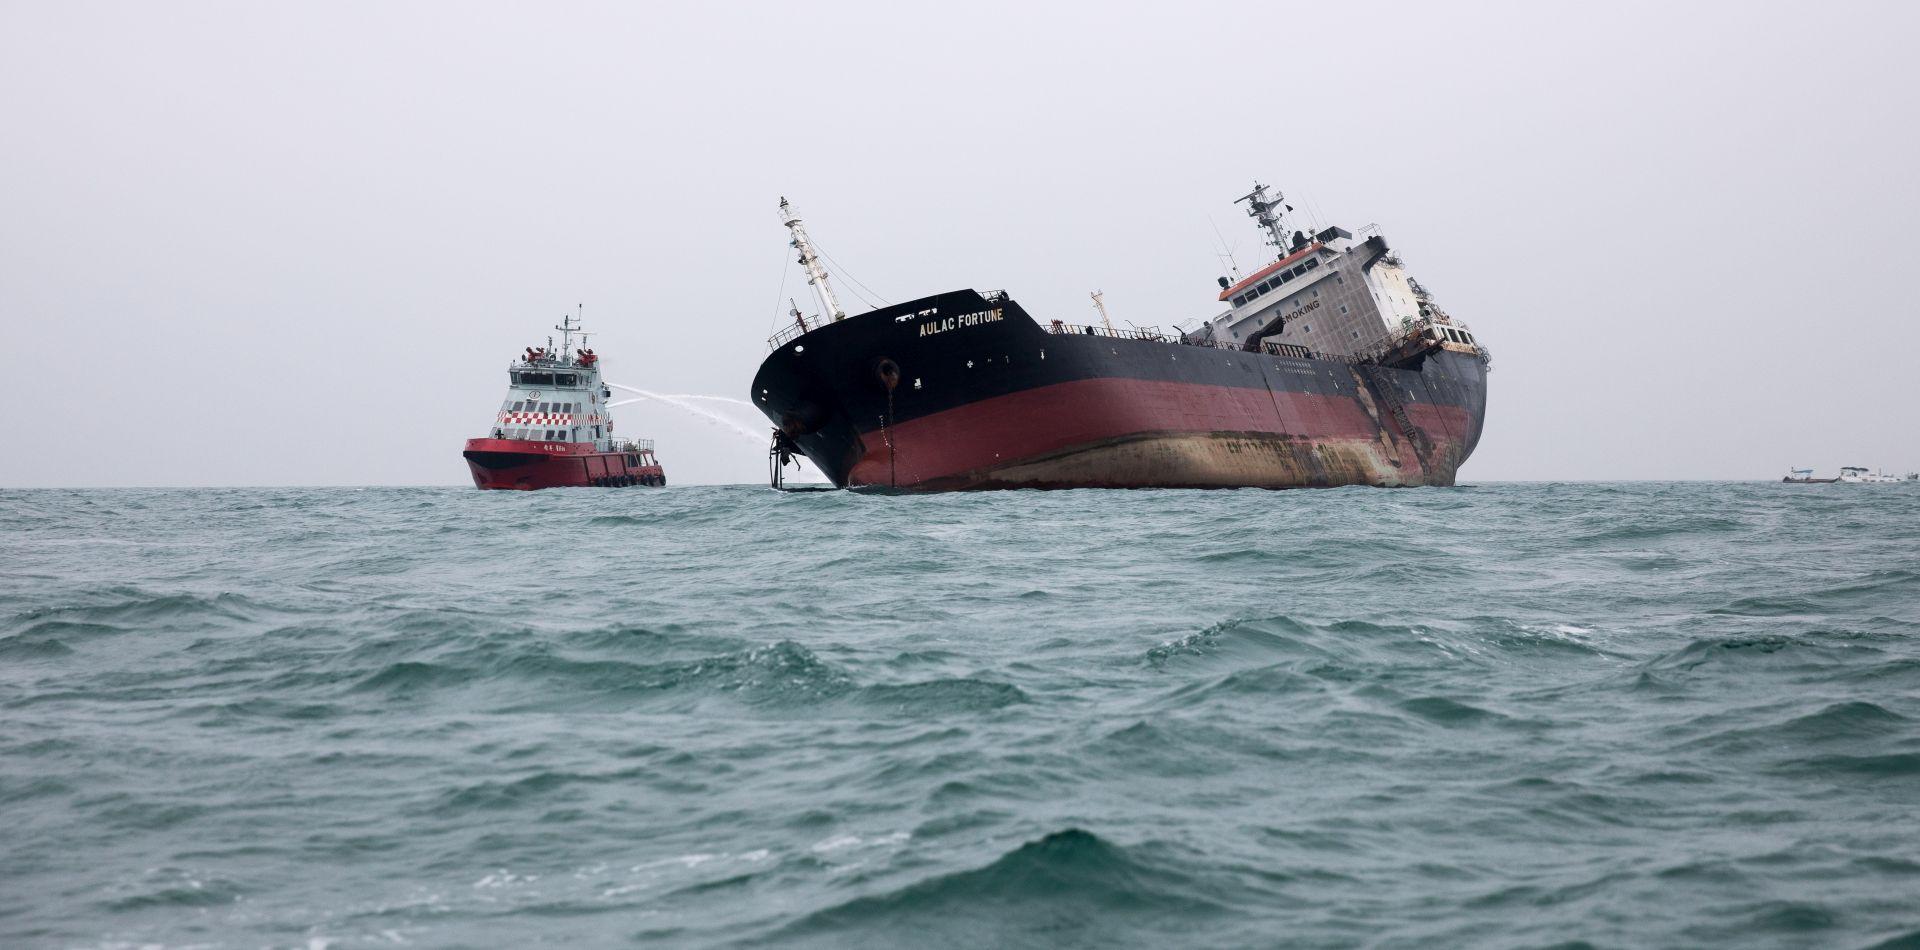 Zapalio se tanker kod Hong Konga, jedna osoba poginula